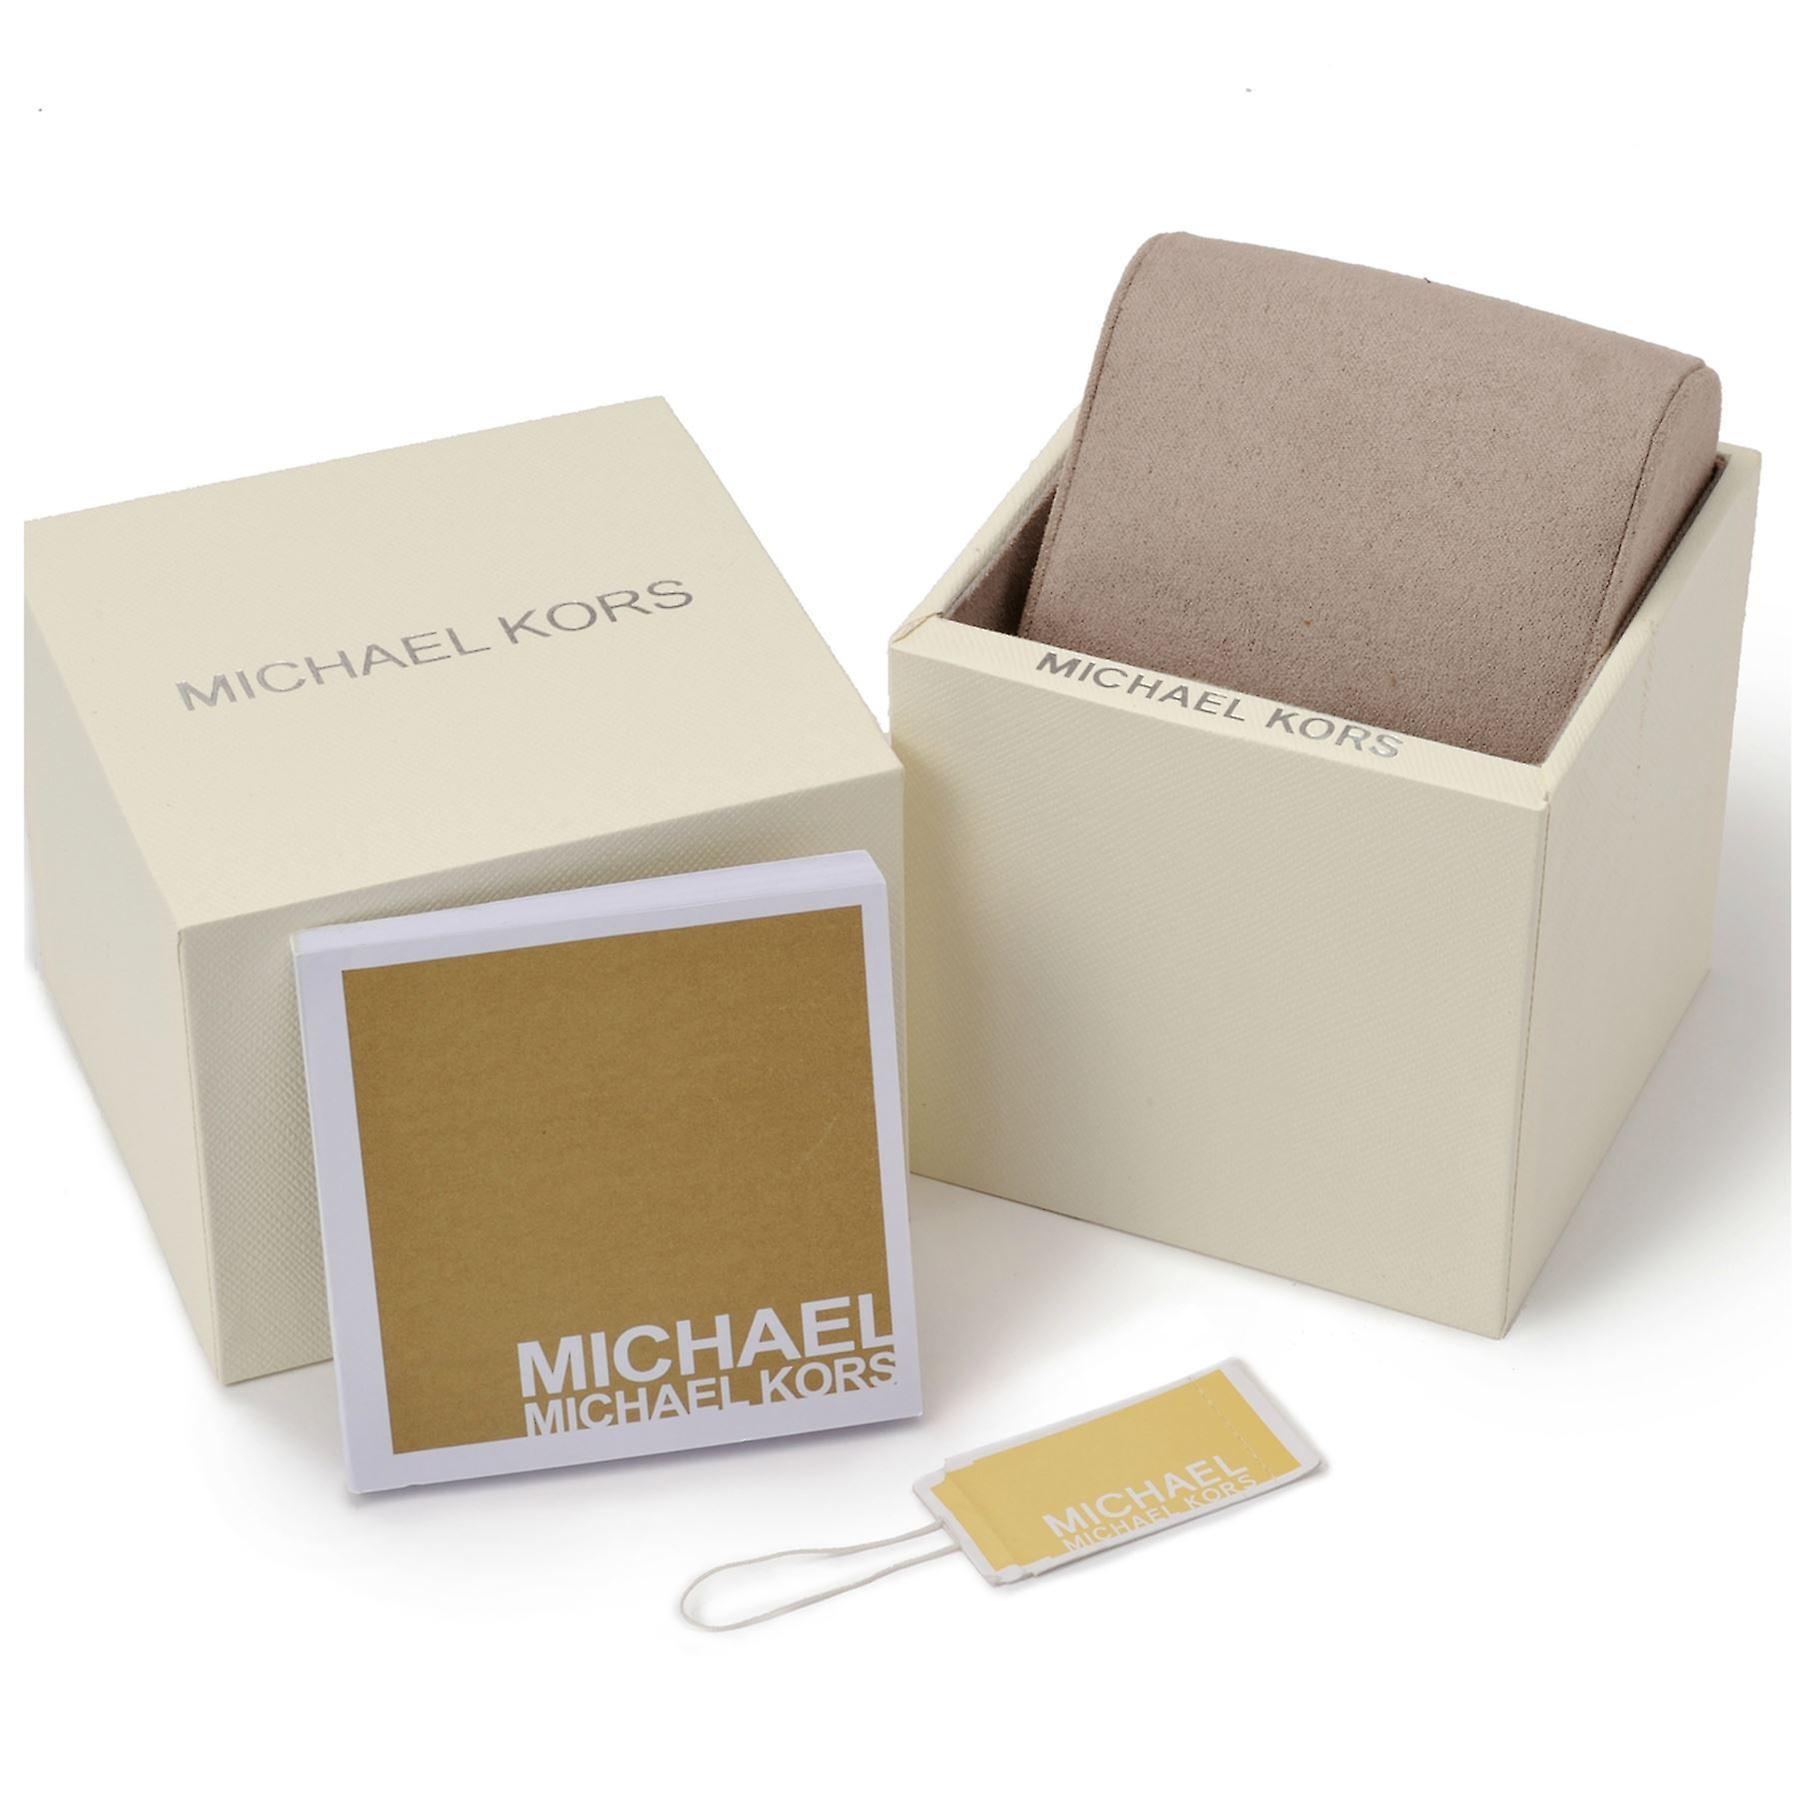 Michael Kors piste Slim Mens Watch cuir marron cadran Champagne MK2606